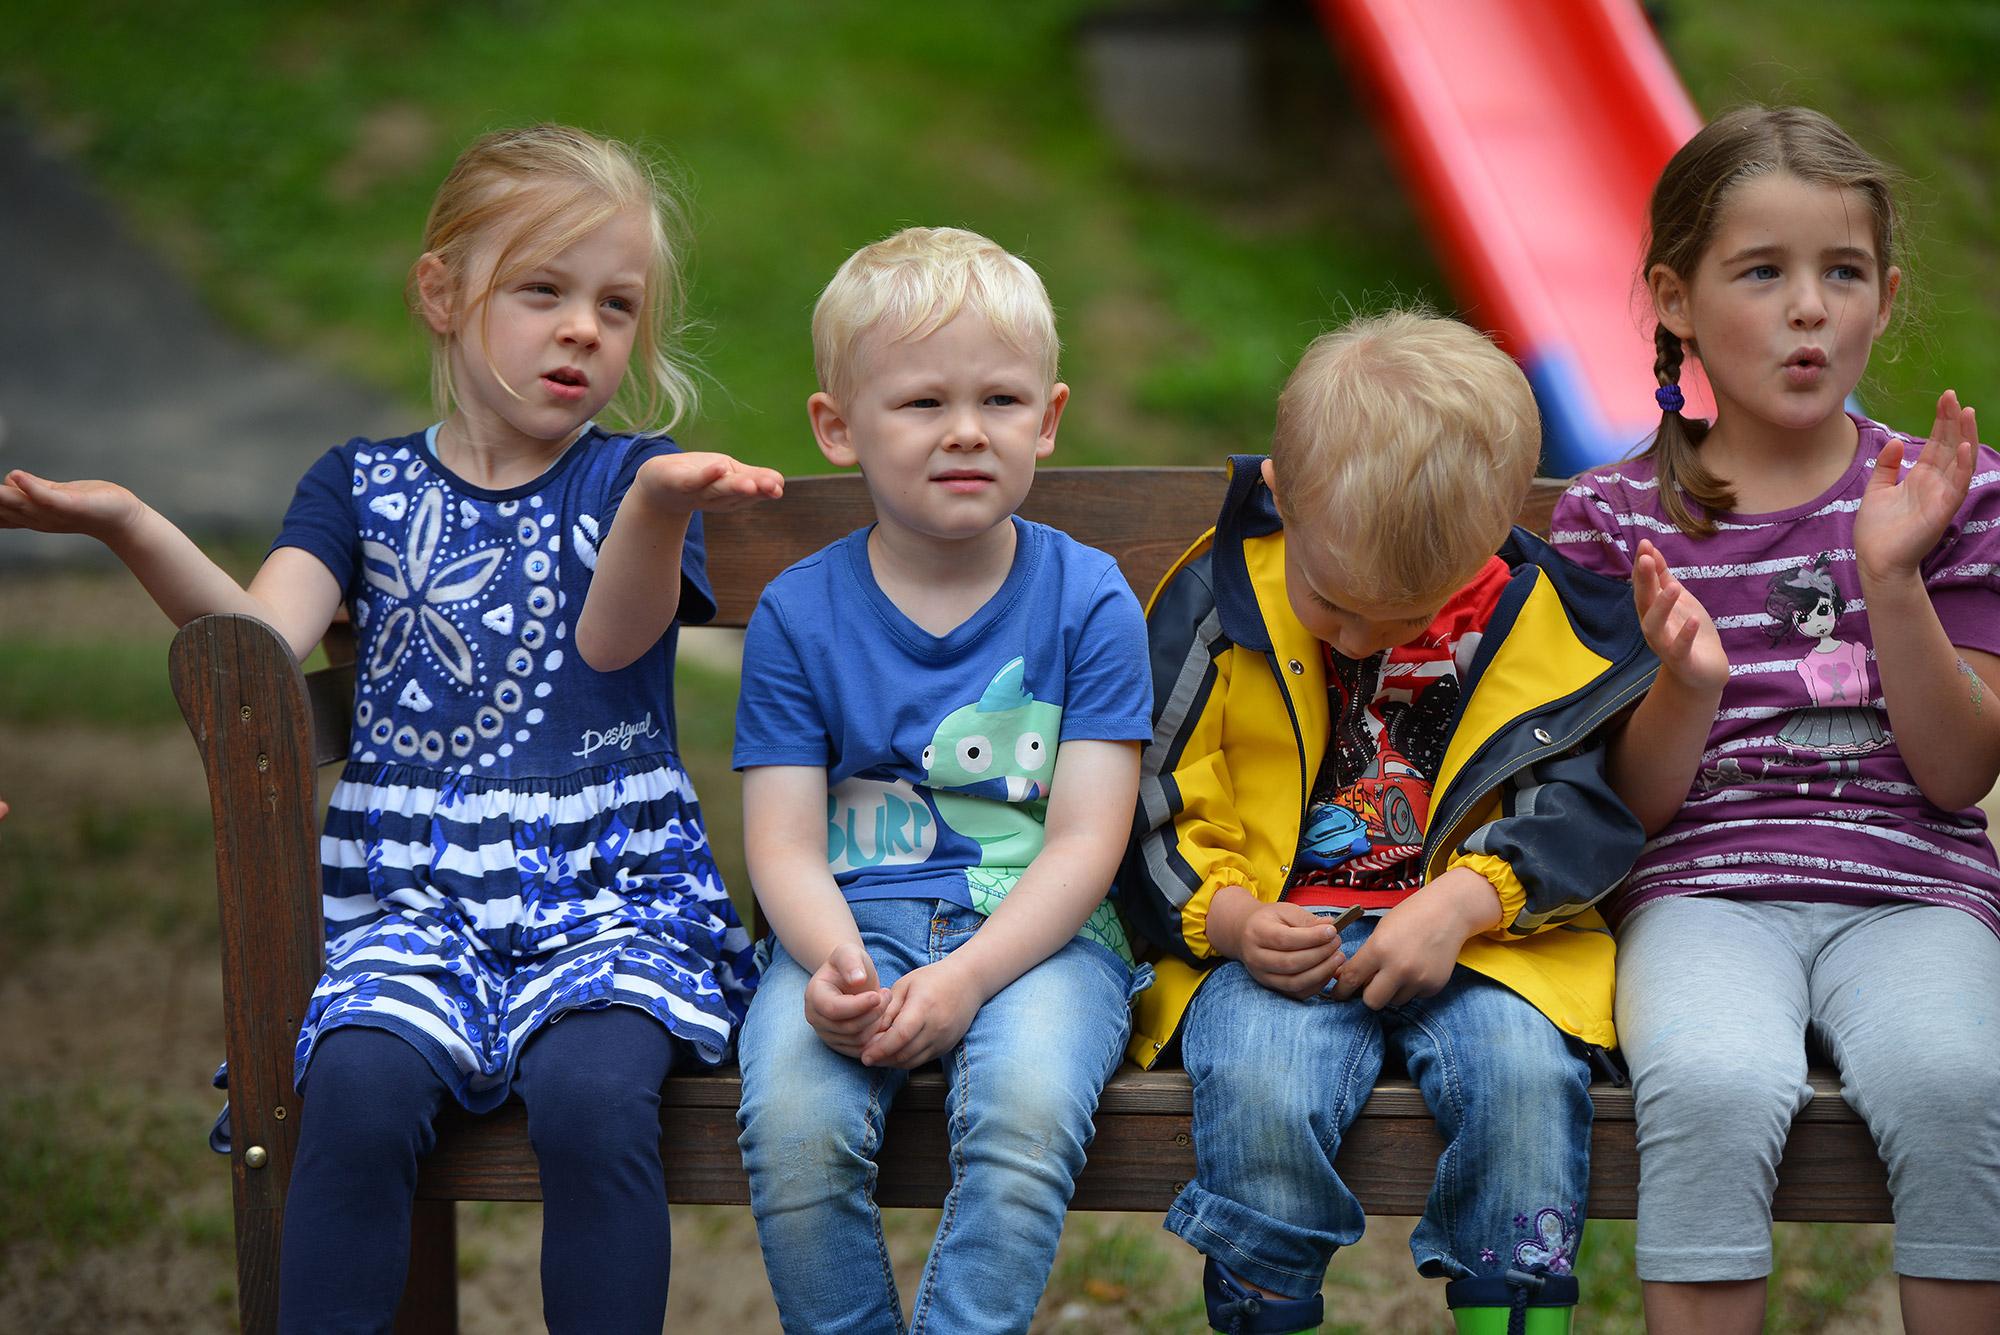 Katholischer Kindergartten St. Elisabeth Nethpen Kinder auf der Bank